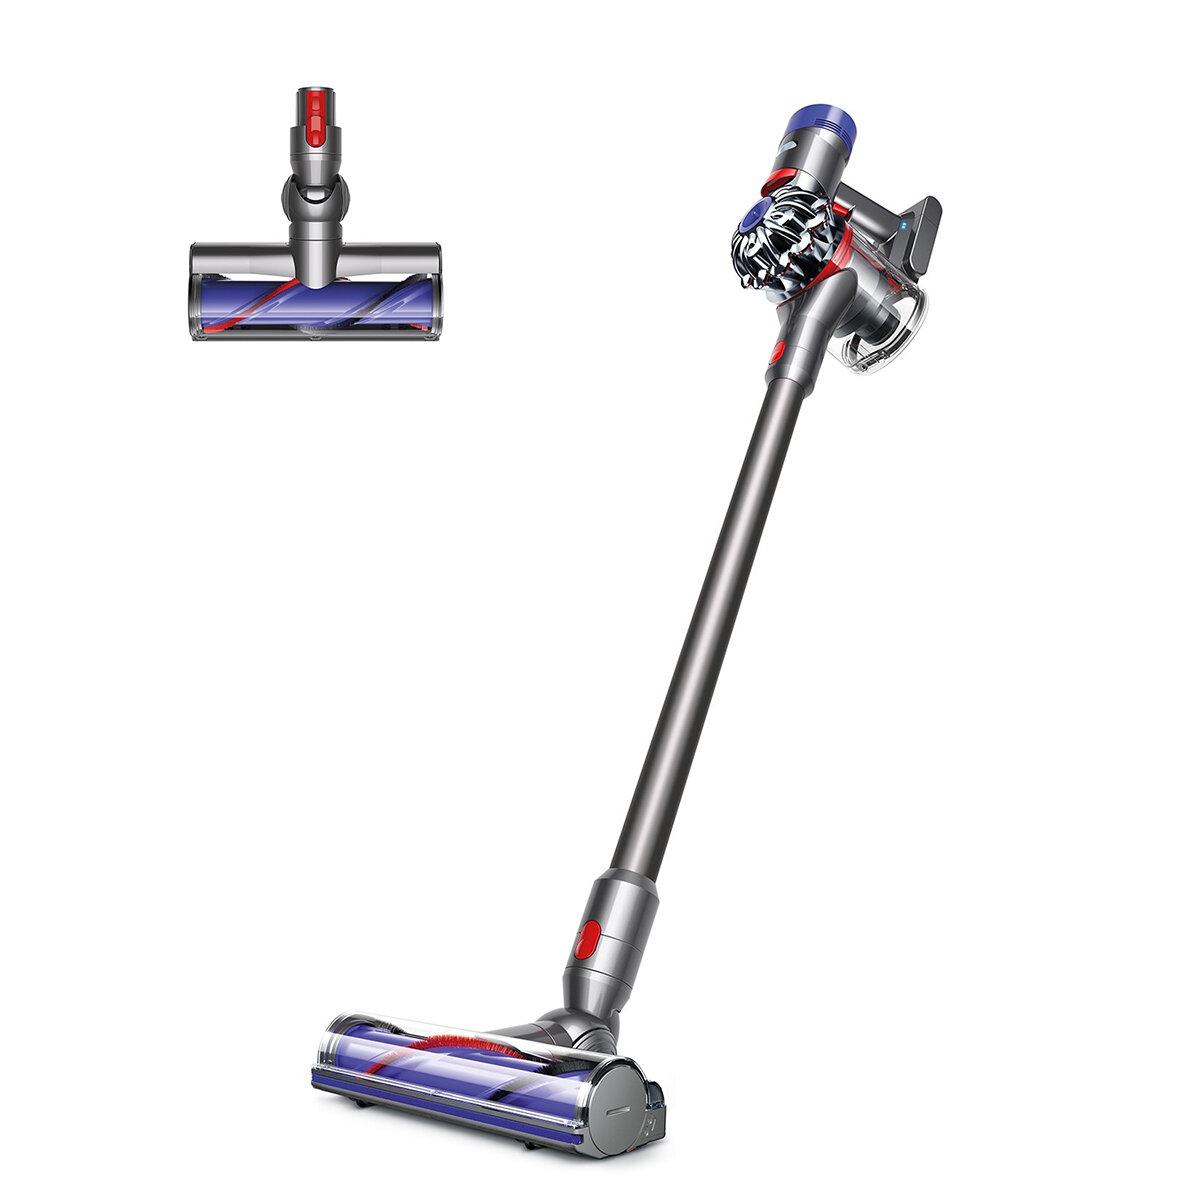 Dyson 271642-01 V8 Origin Handstick Vacuum Cleaner